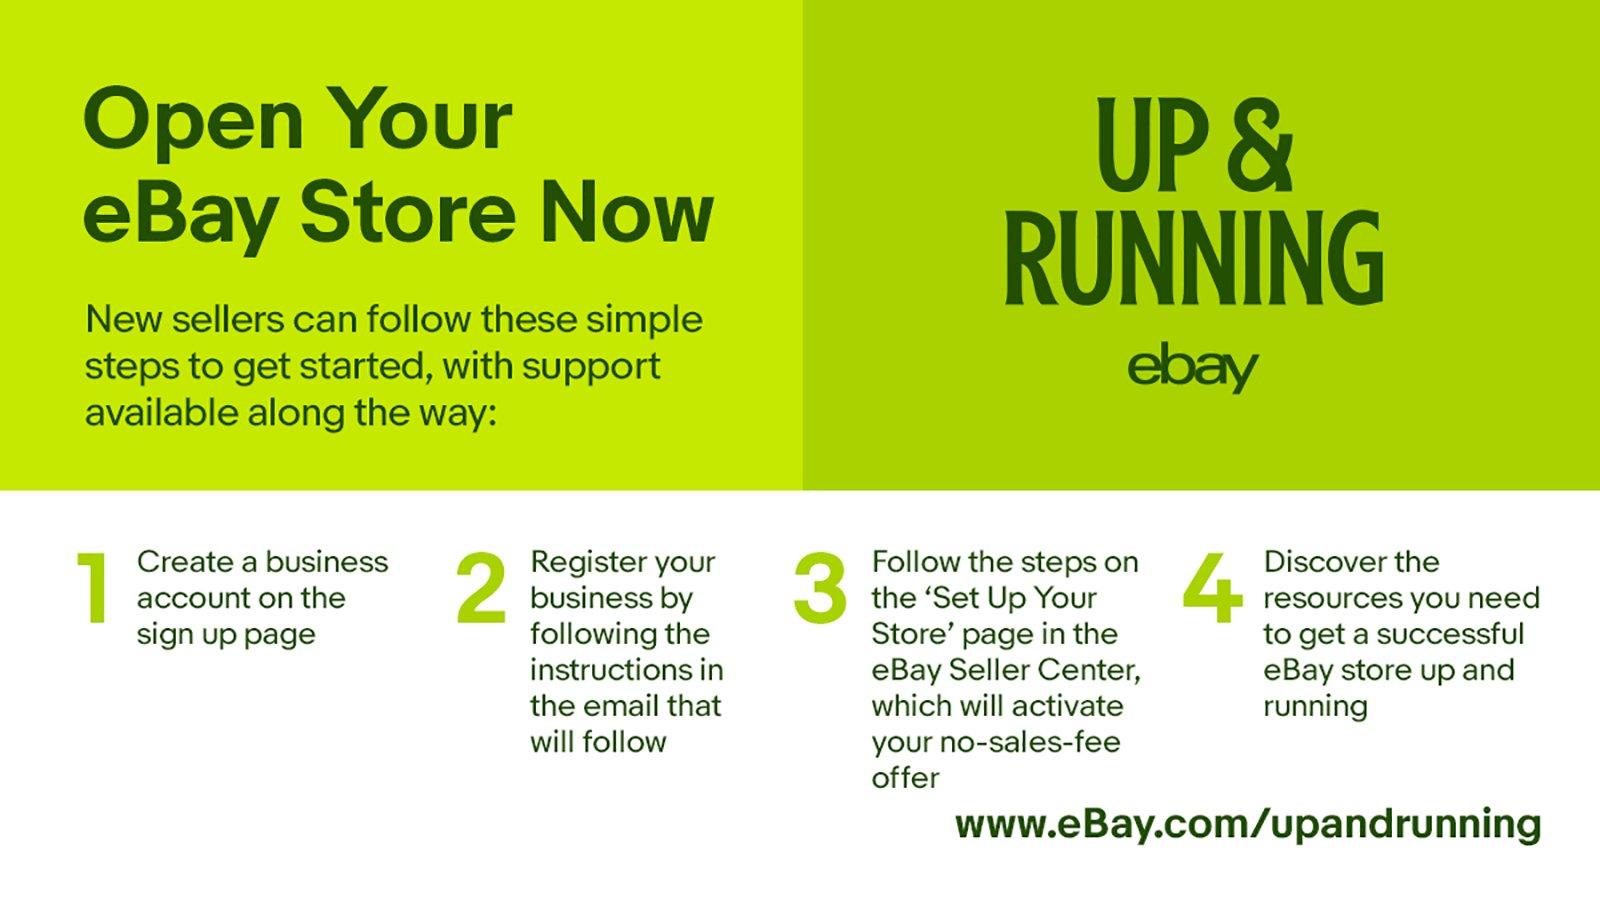 Open new eBay Store